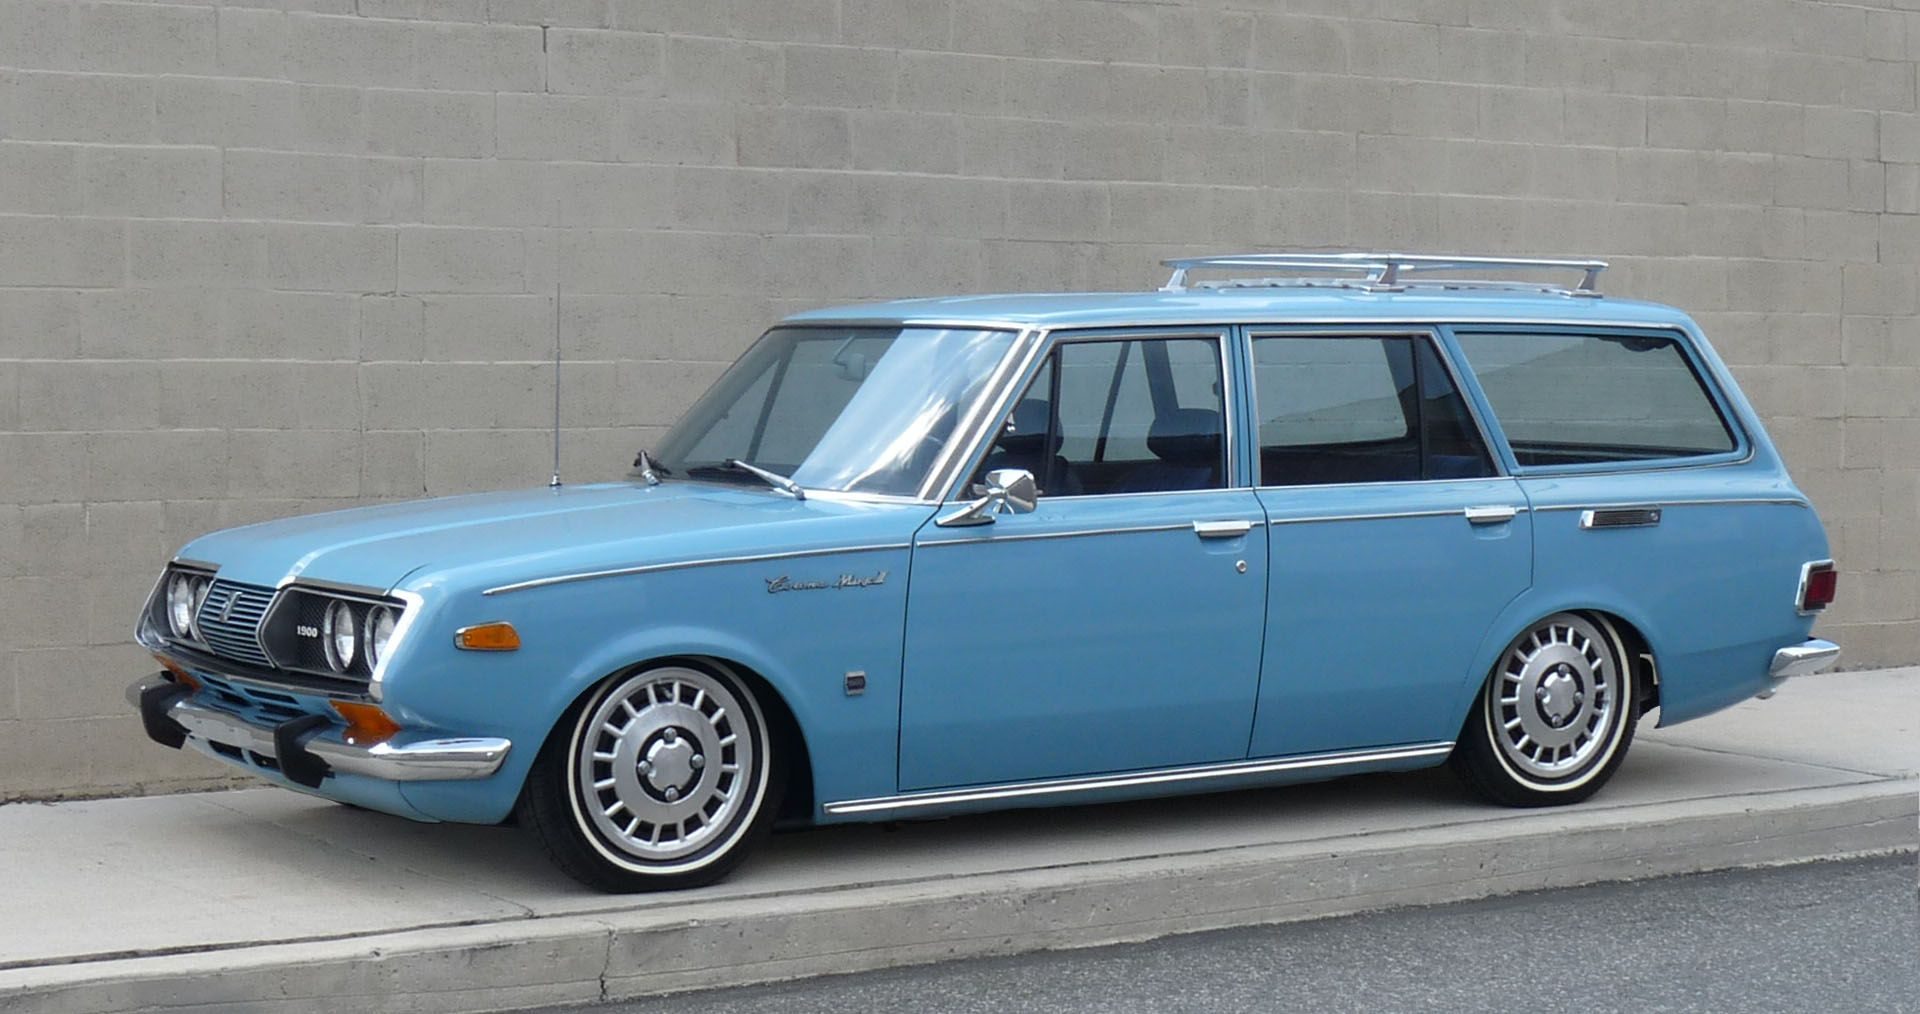 1971 Toyota Corona Mark Ii Wagon Toyota Corona Classic Cars Wagon Cars